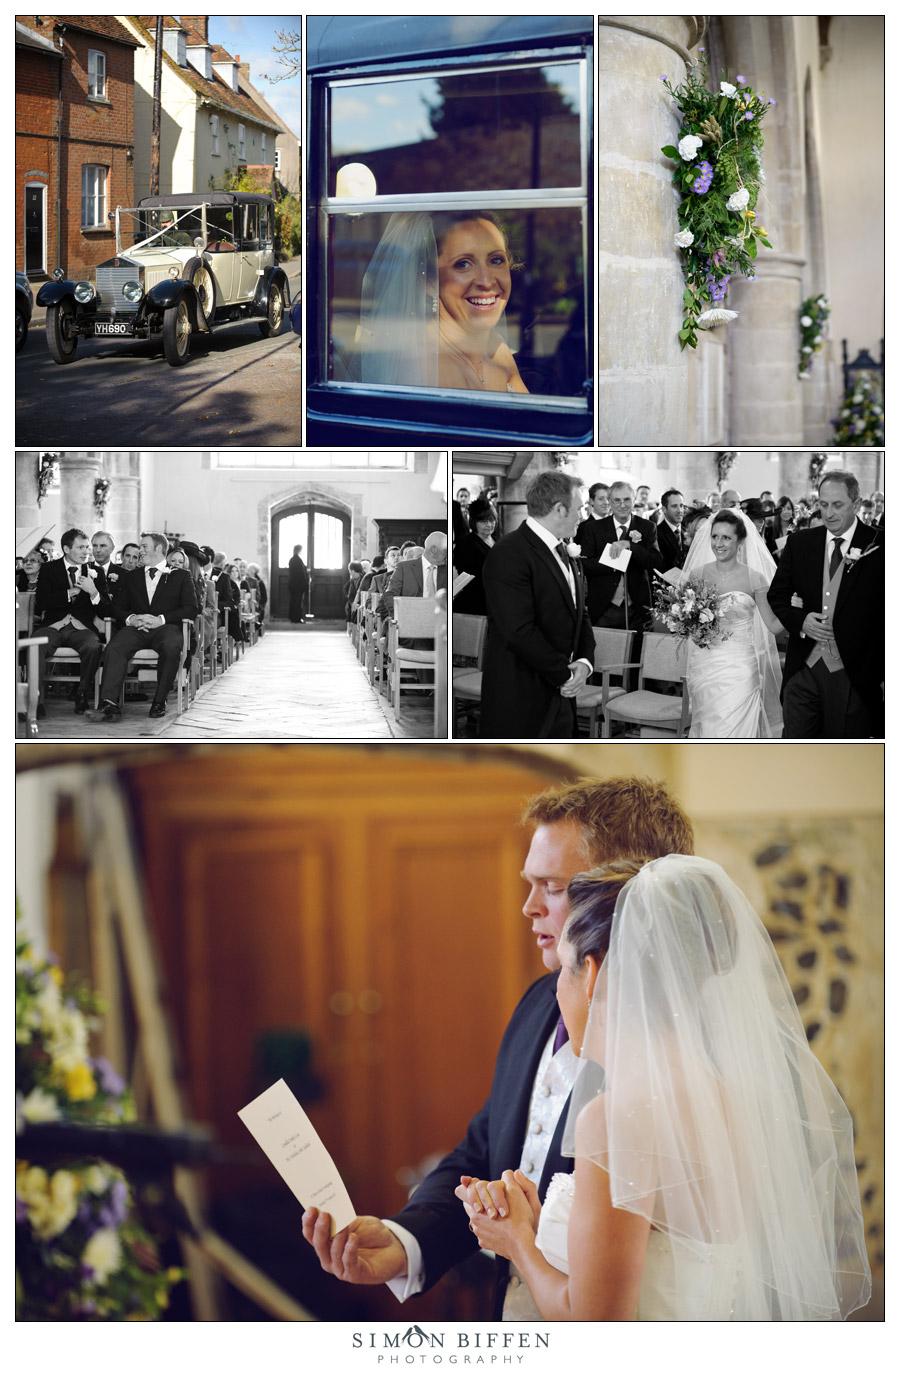 Wedding ceremony St Marys Church, Fordingbridge - Simon Biffen Photography